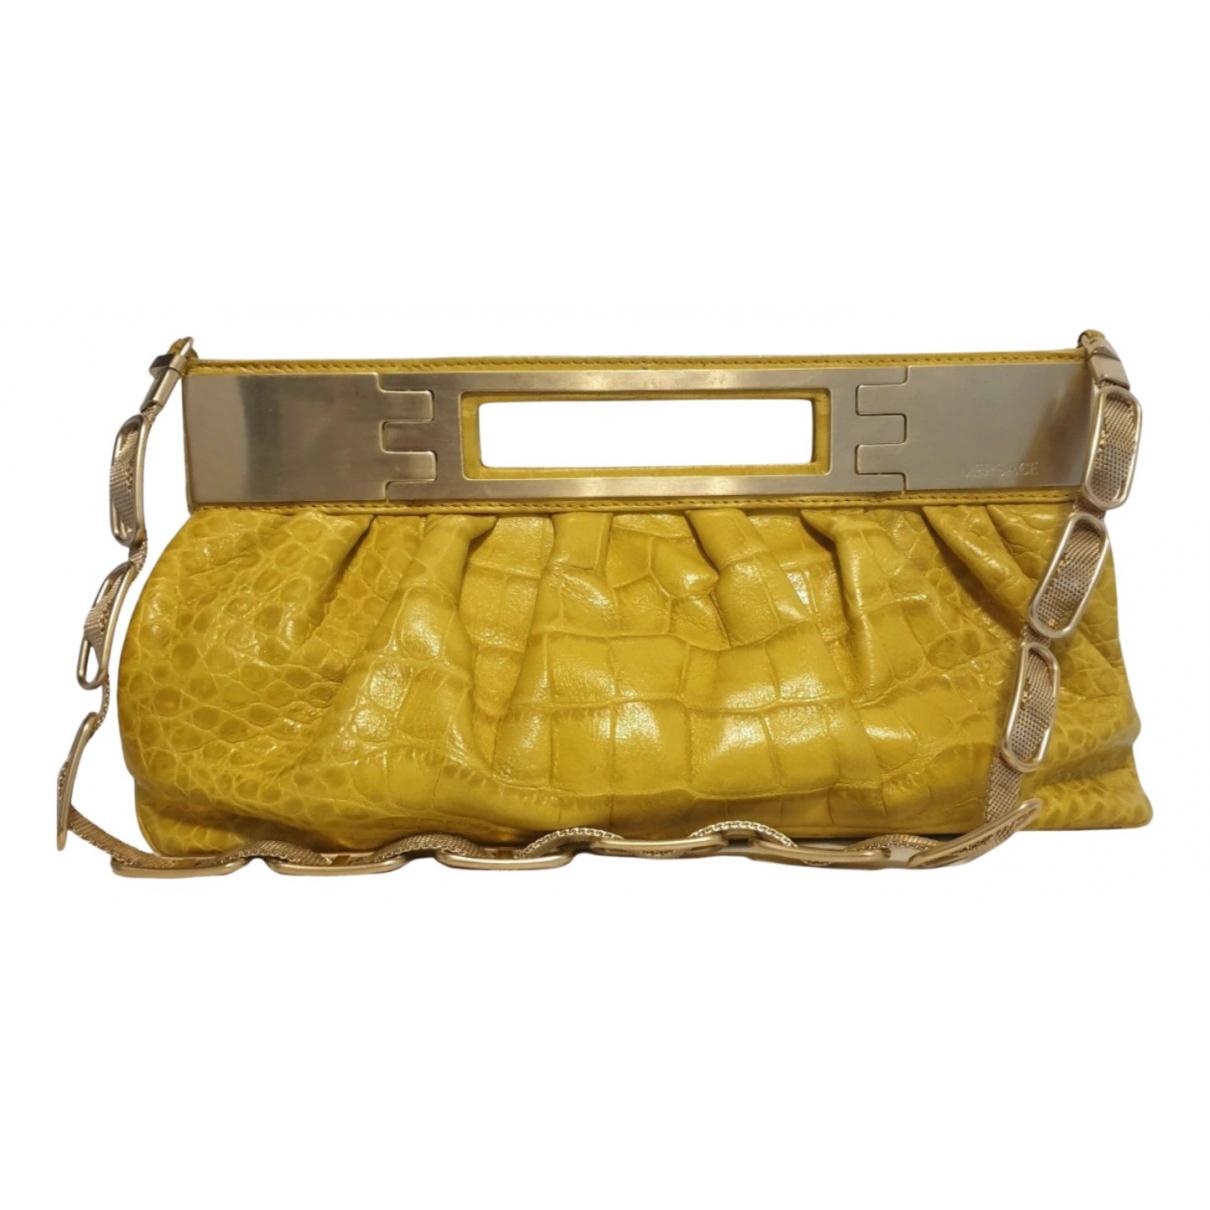 Versace N Gold Leather handbag for Women N